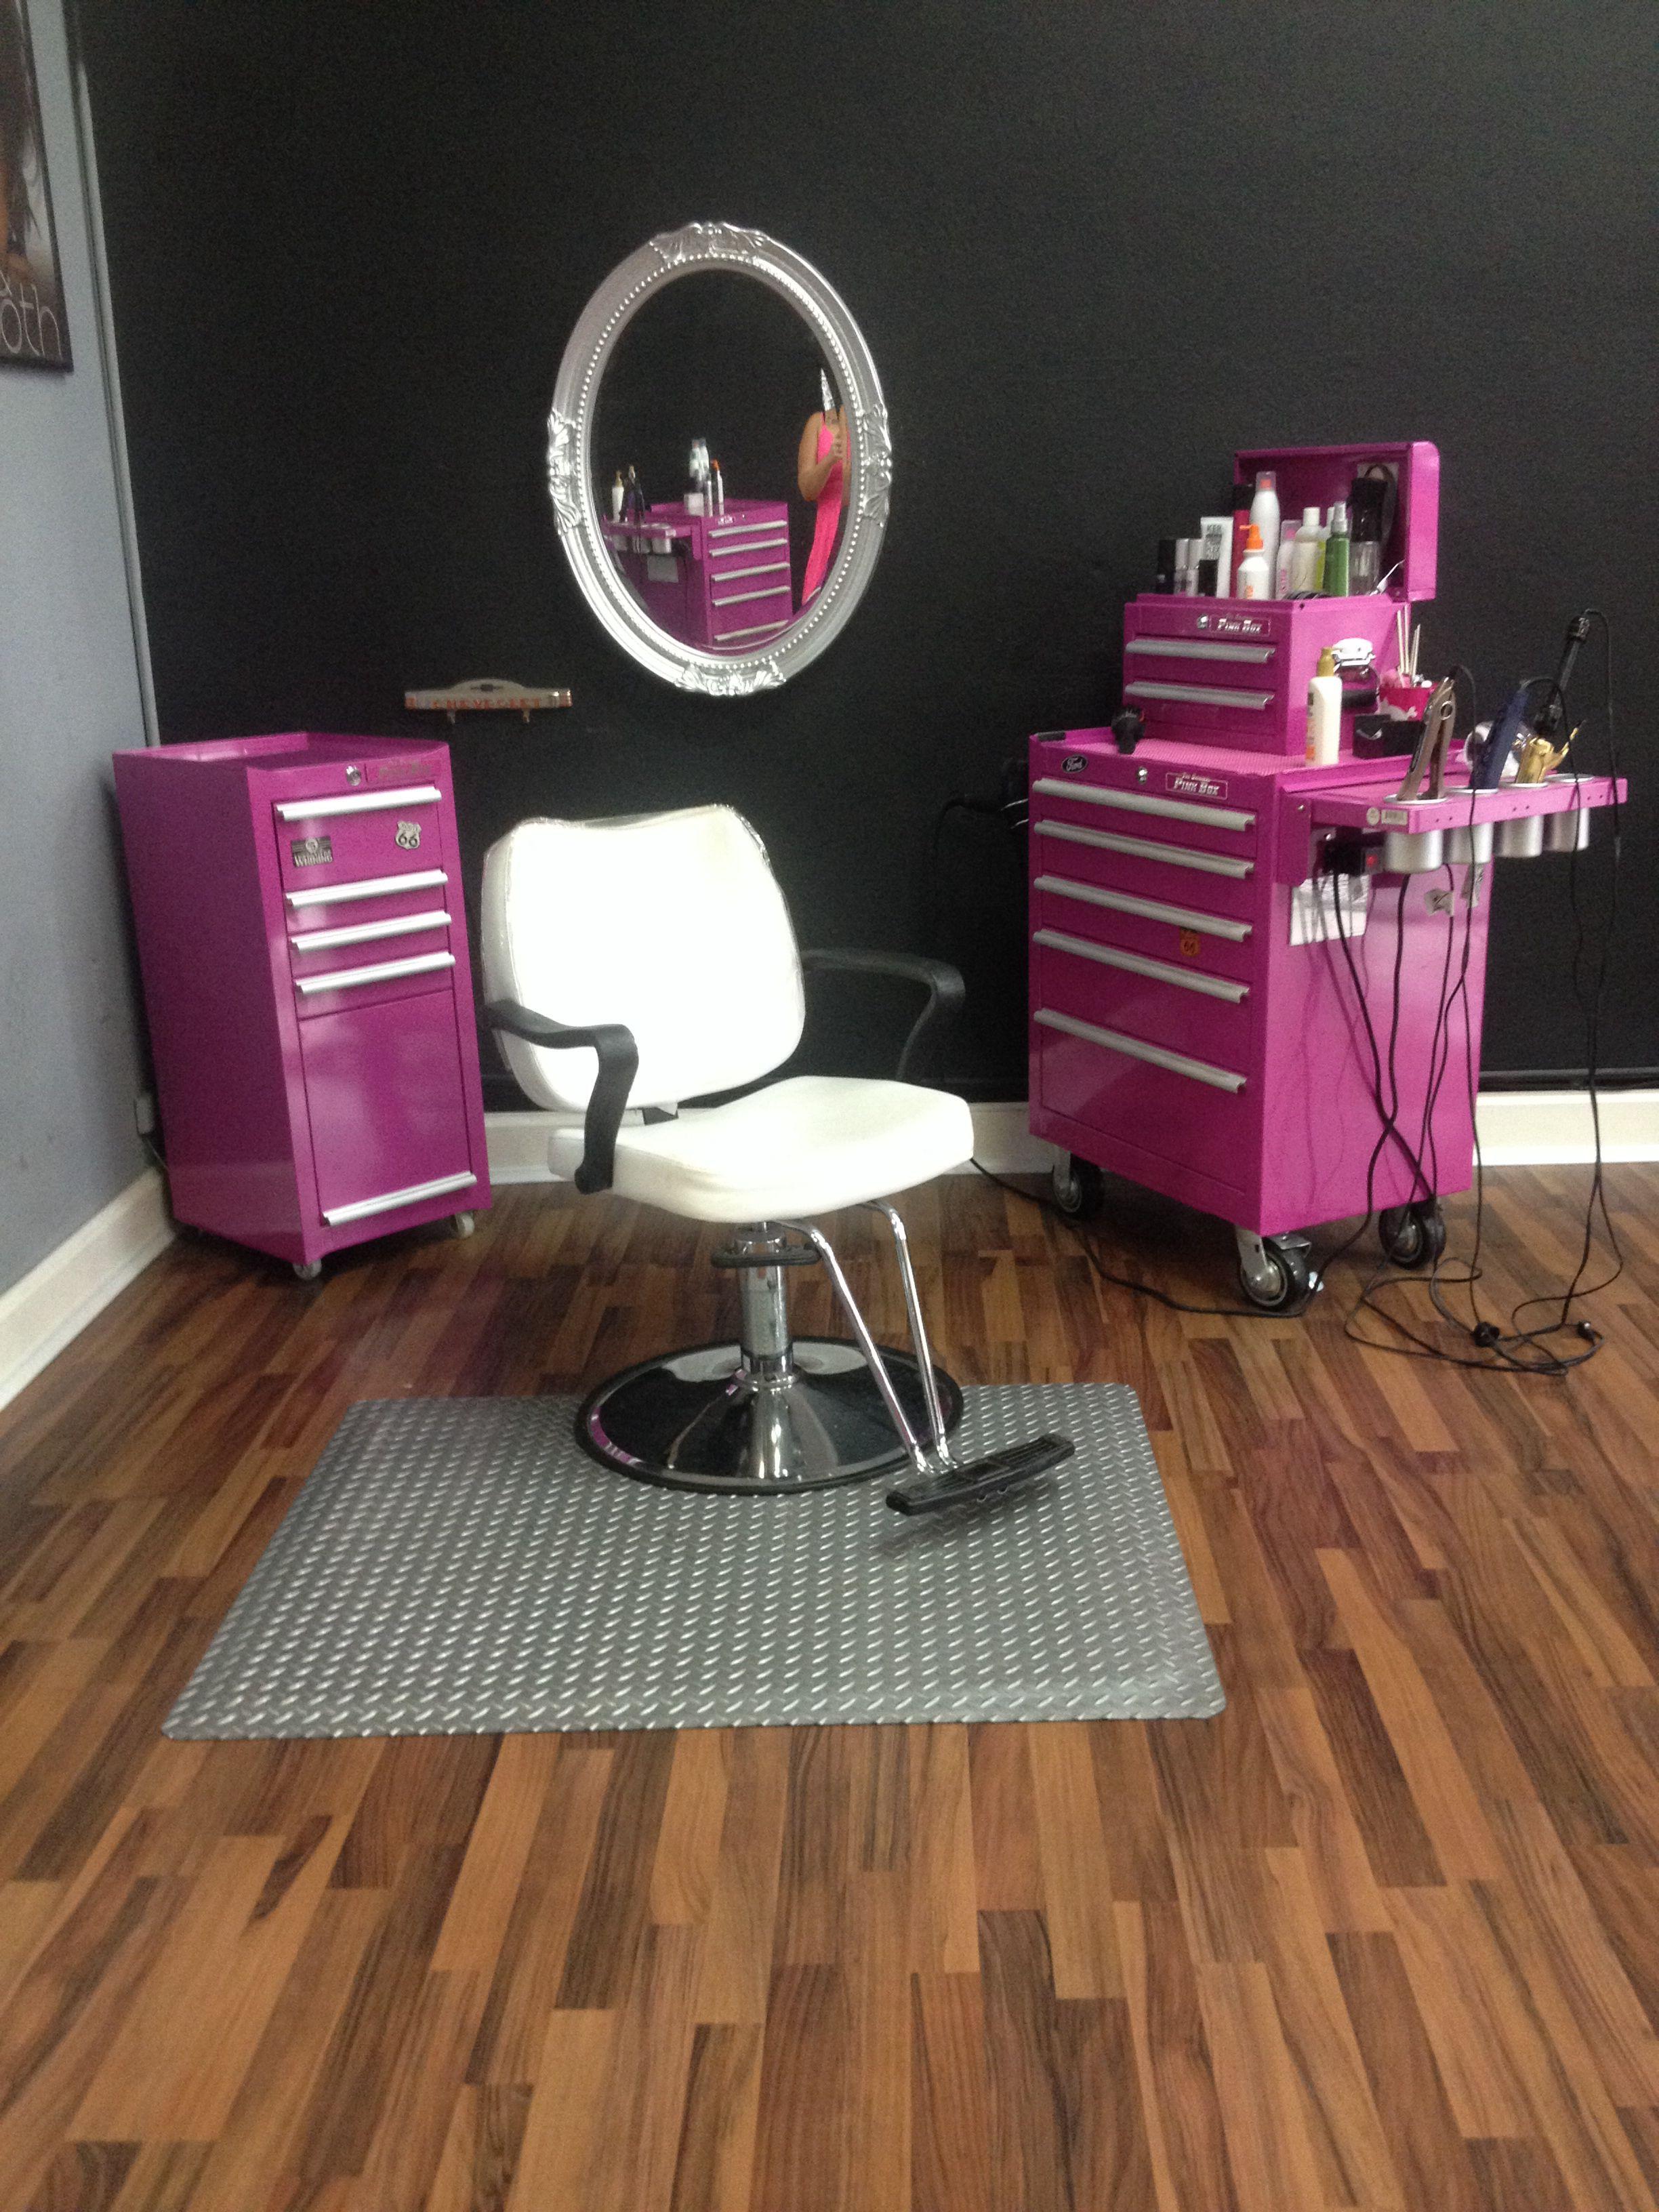 Kadillac barbies salon and spa the original pink box pink tool box route 66 salon kadillac - Salon original ...